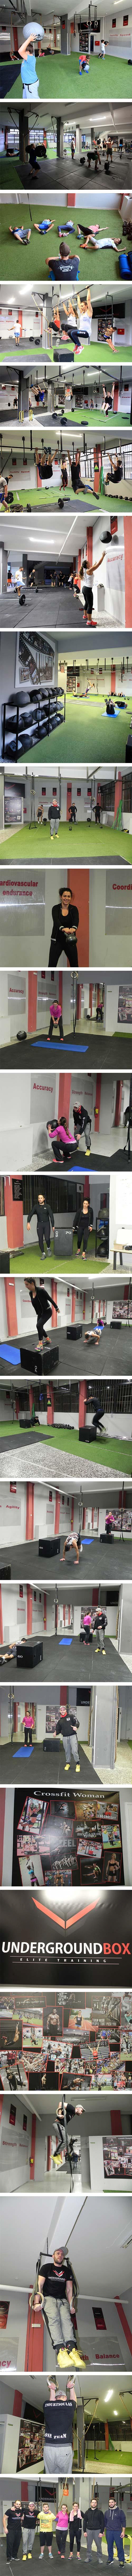 tsourtsoylas crossfit gym